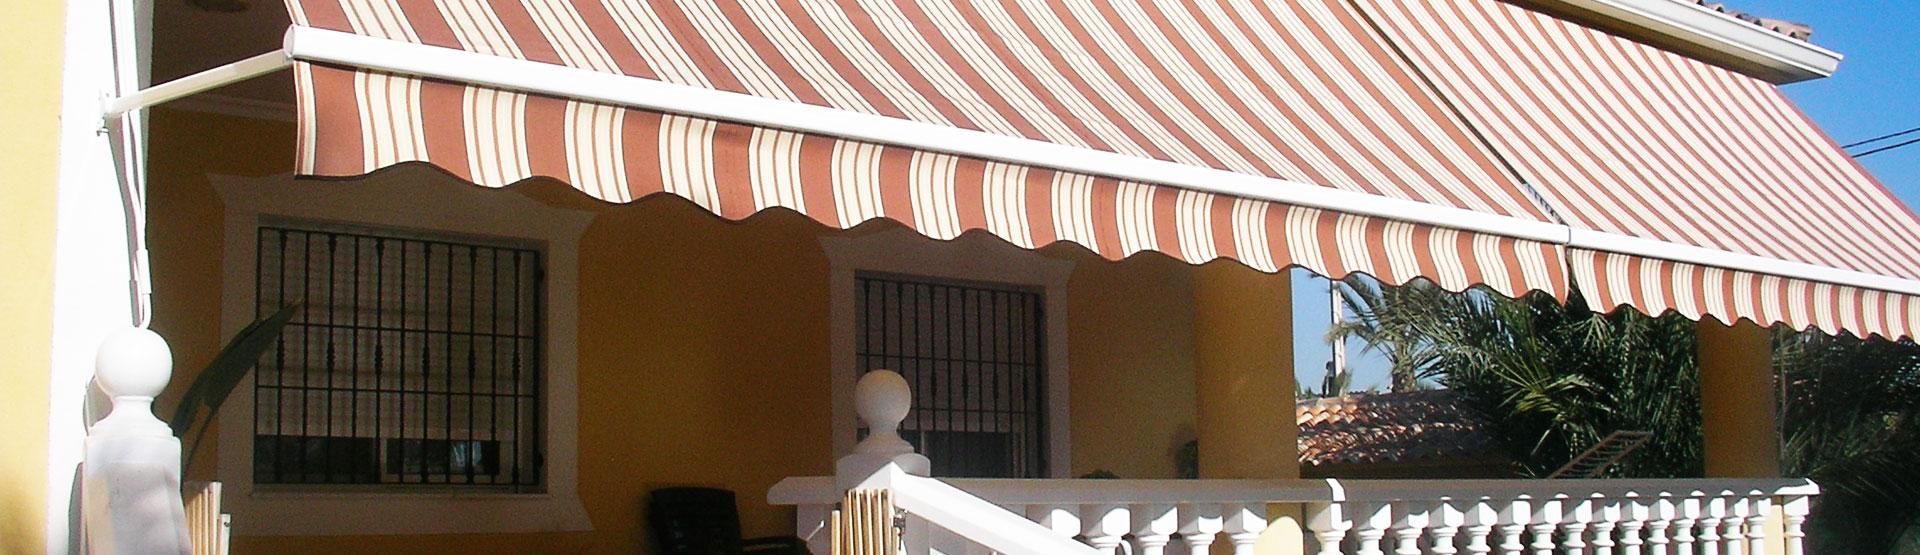 toldo hogar tendals natura